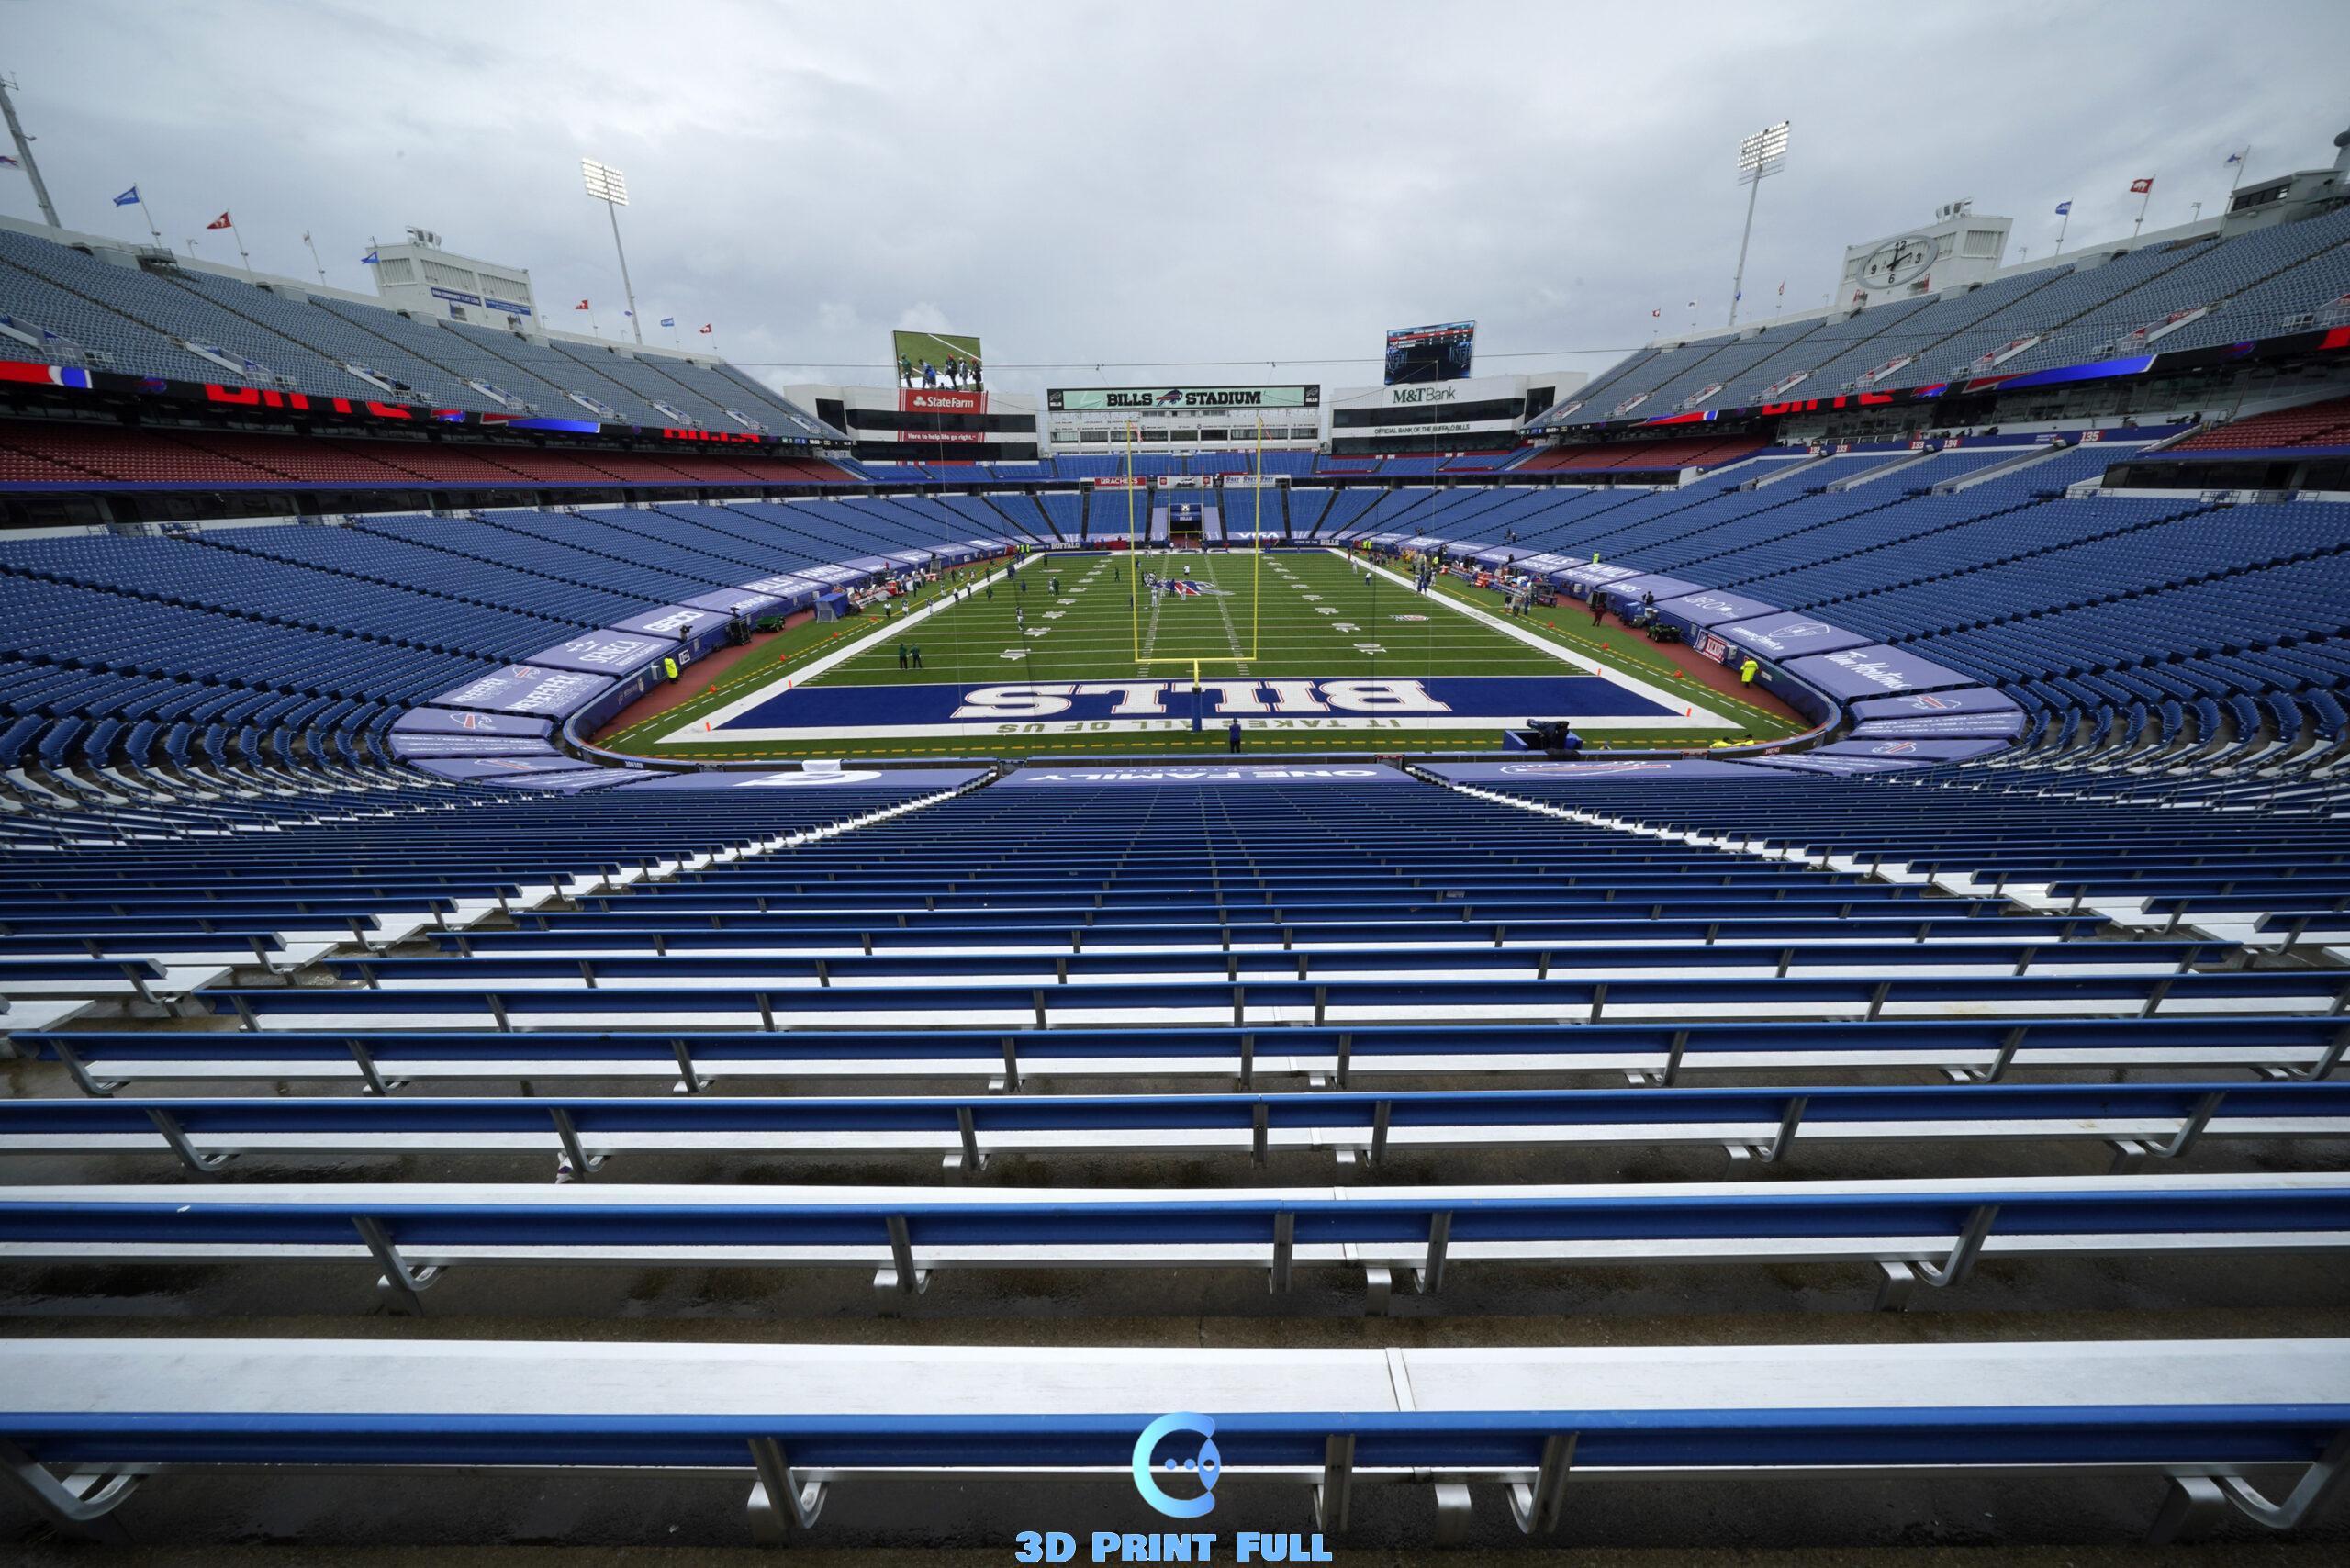 Where is buffalo bills stadium